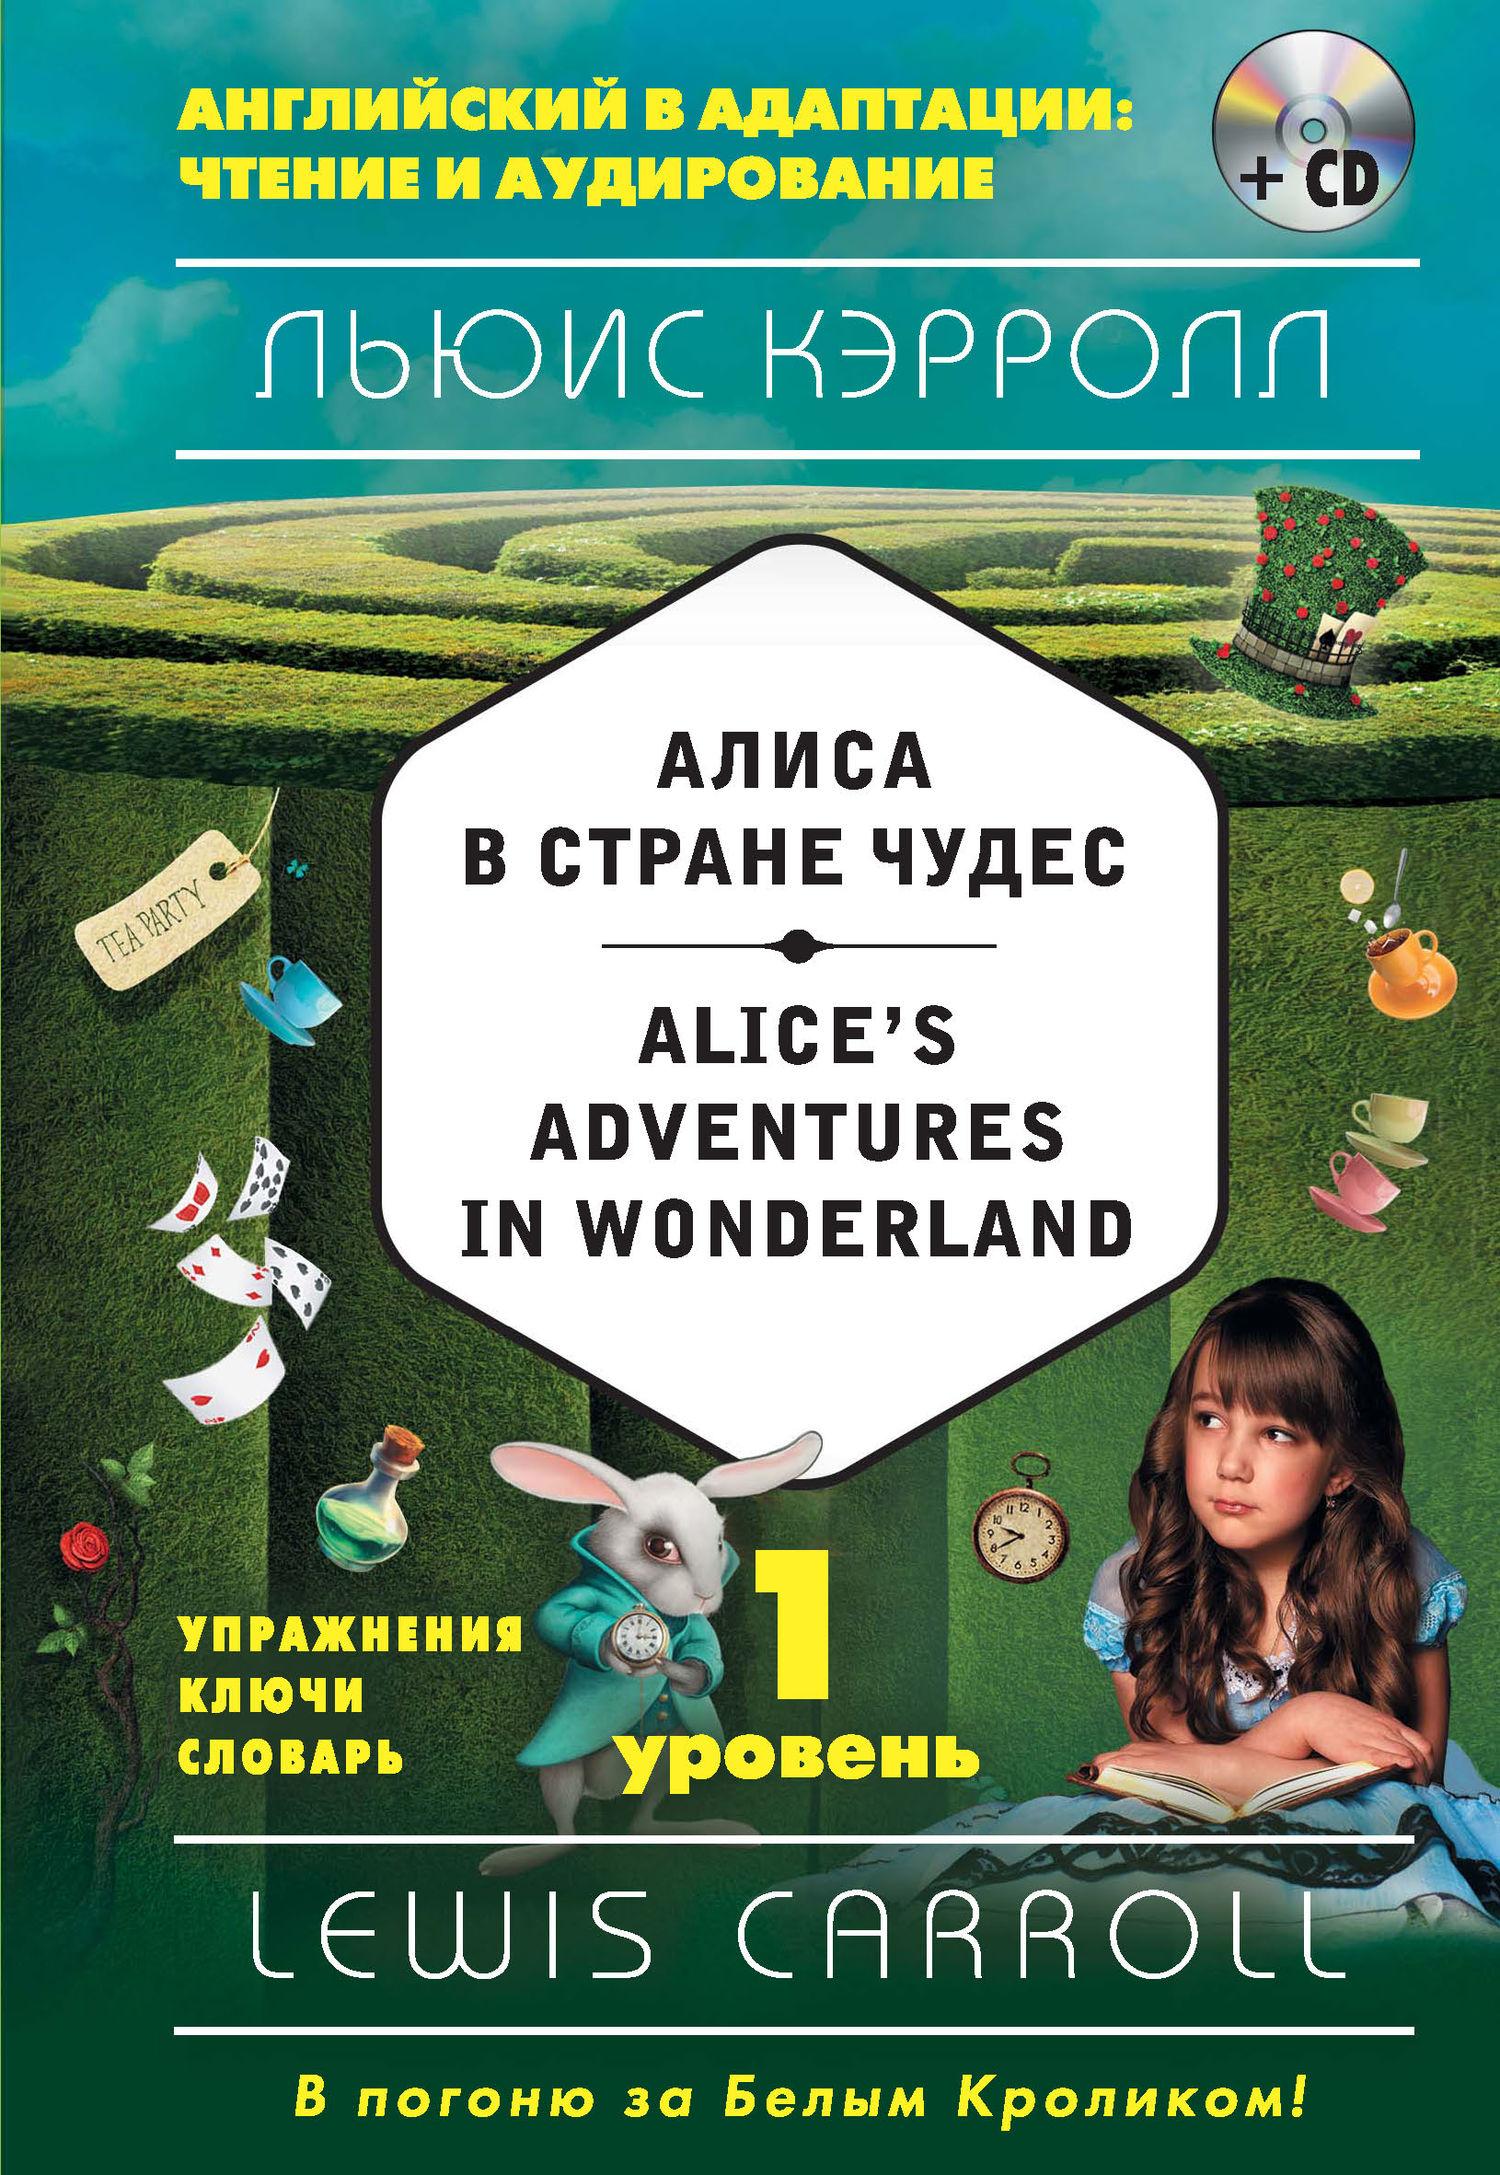 Льюис Кэрролл. Алиса в Стране чудес / Alice's Adventures in Wonderland. 1 уровень (+MP3)